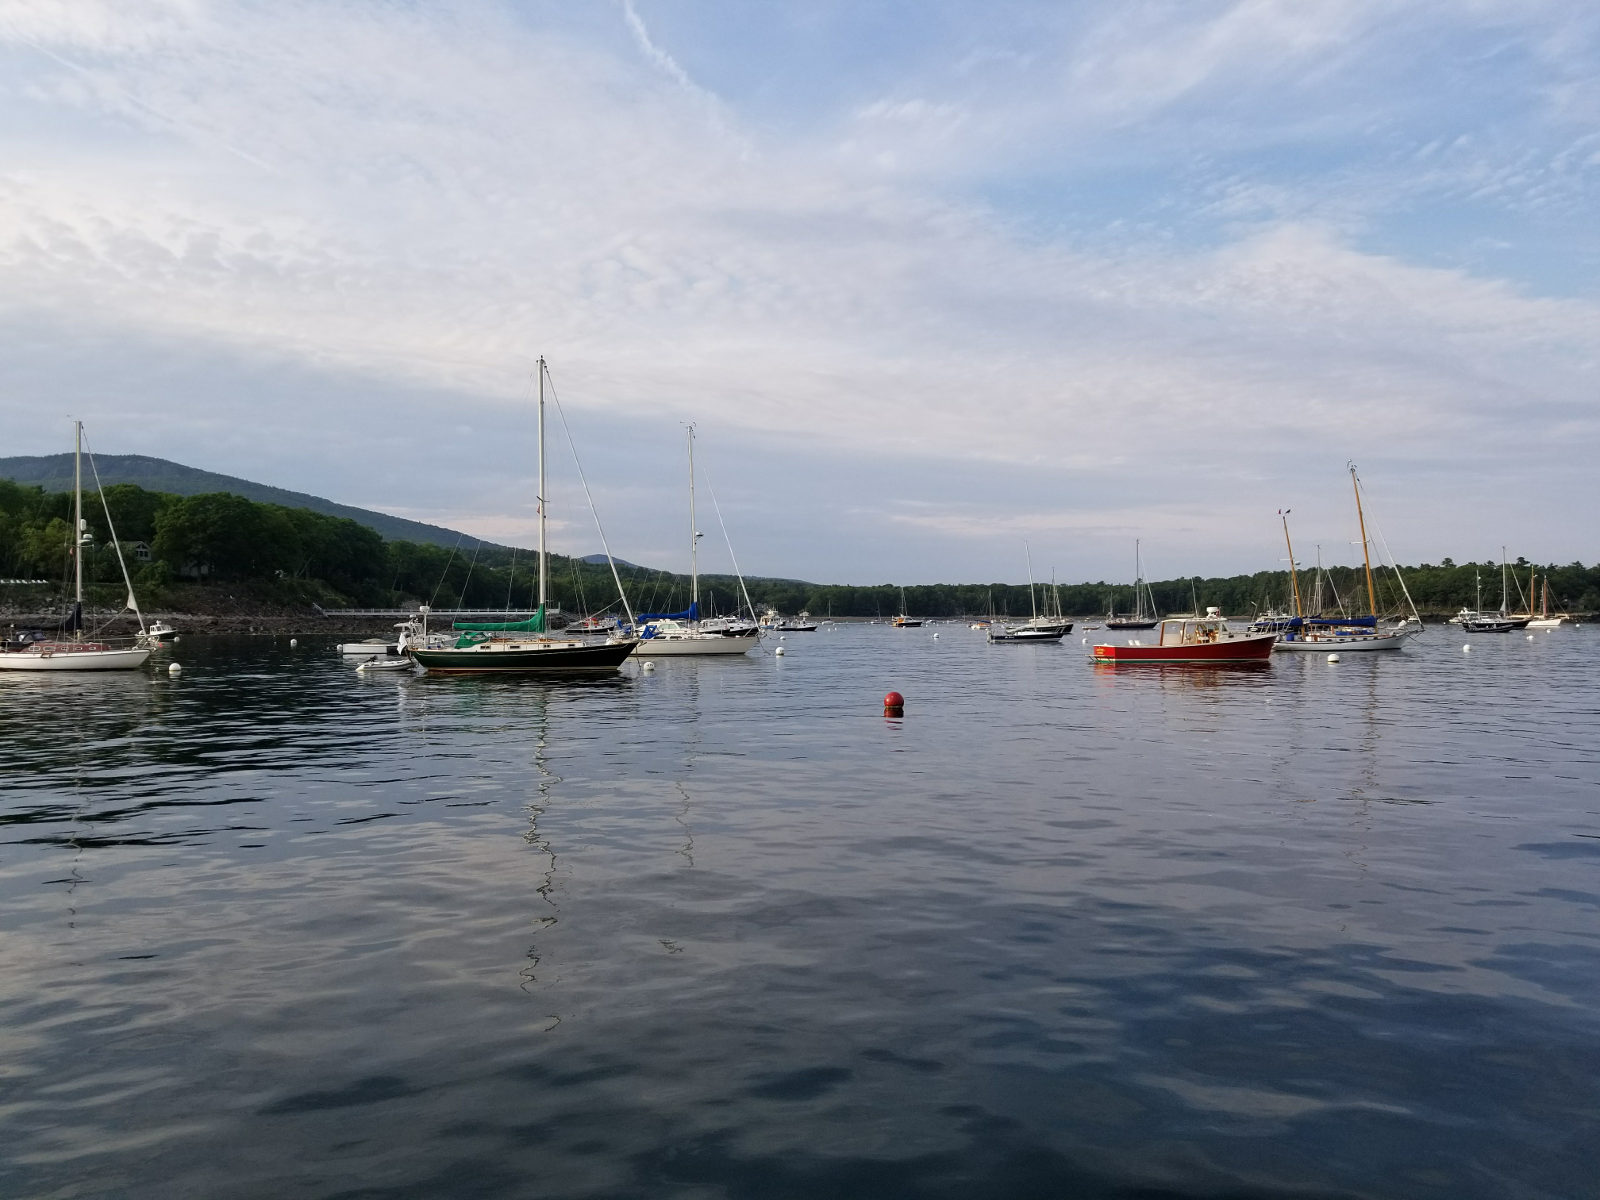 Sailing on the Appledore